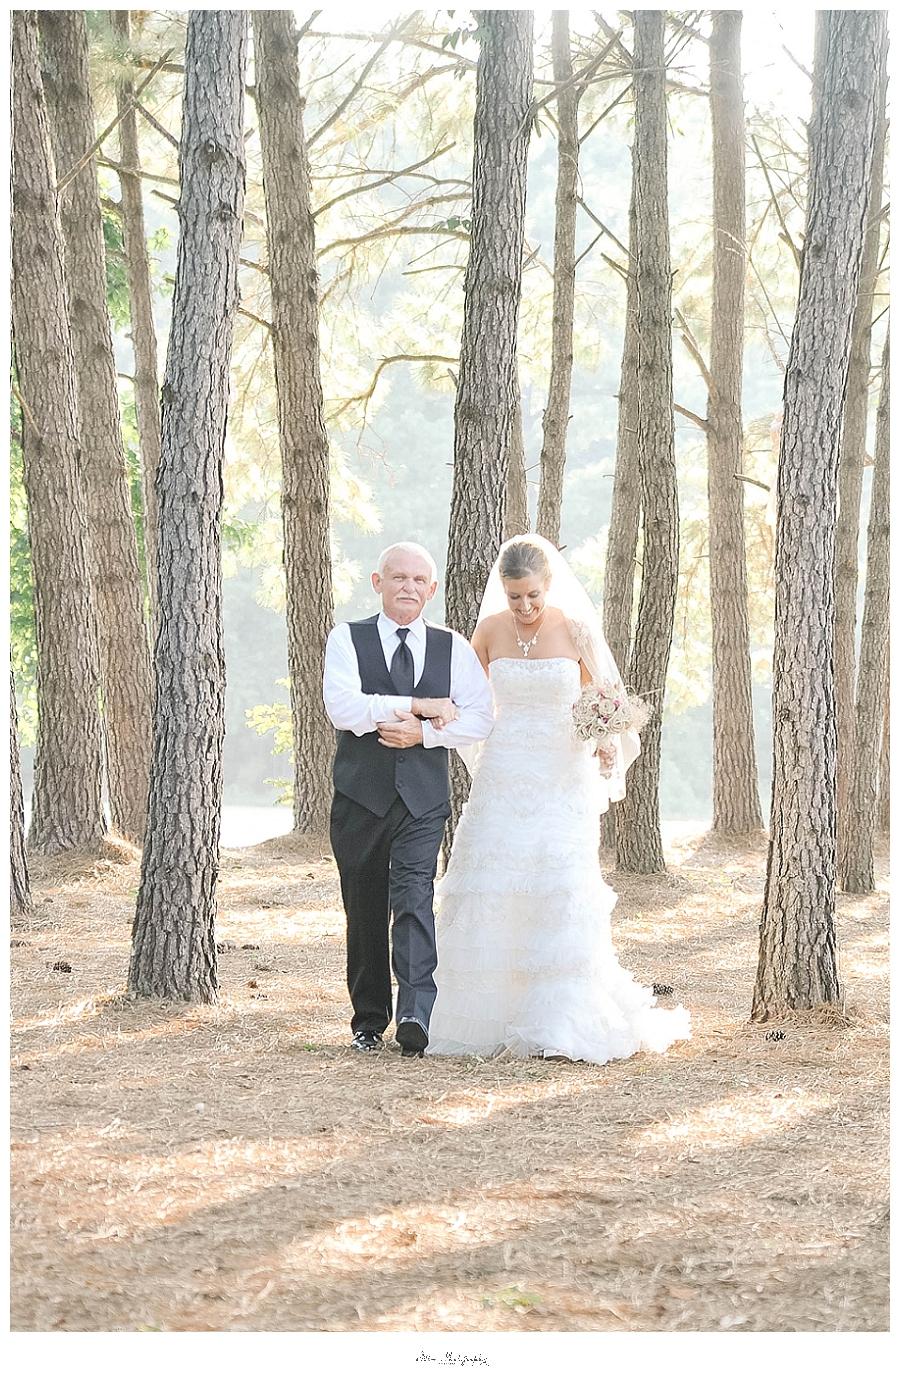 photo of grandfather walking bride down pine tree aisle at Charleston wedding